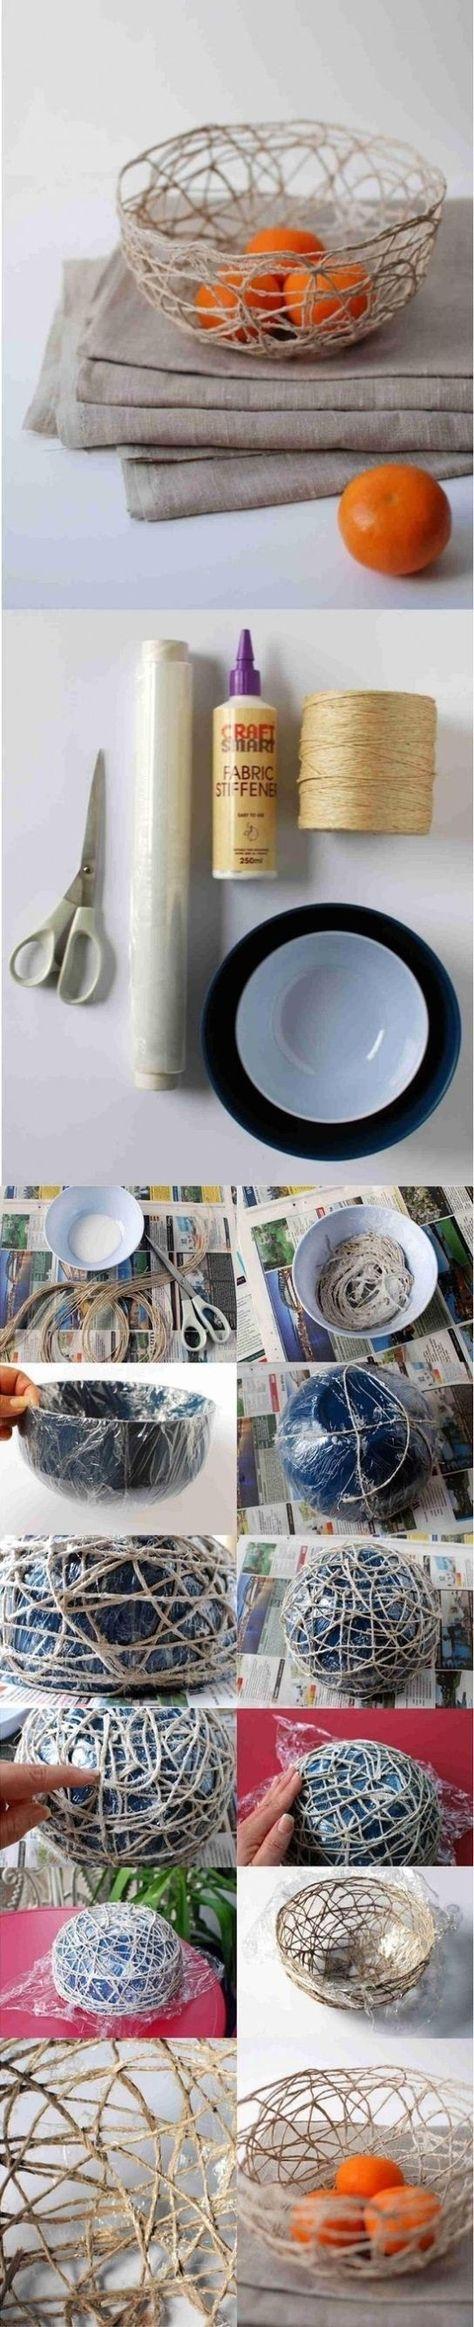 DIY Bowl diy crafts craft ideas easy crafts diy ideas diy idea diy home easy diy for the home crafty decor home ideas diy decorations diy bowl